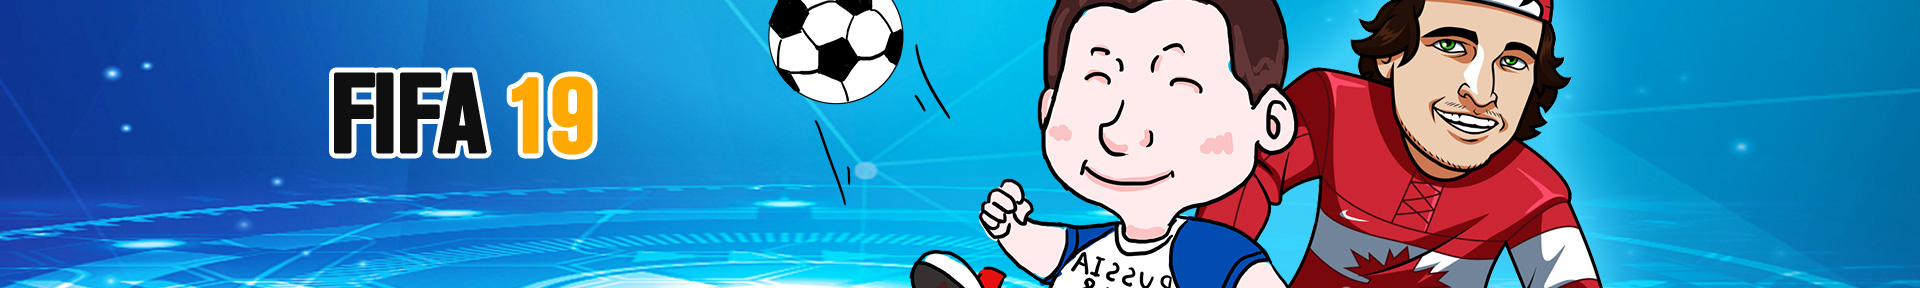 FIFA 19 Account